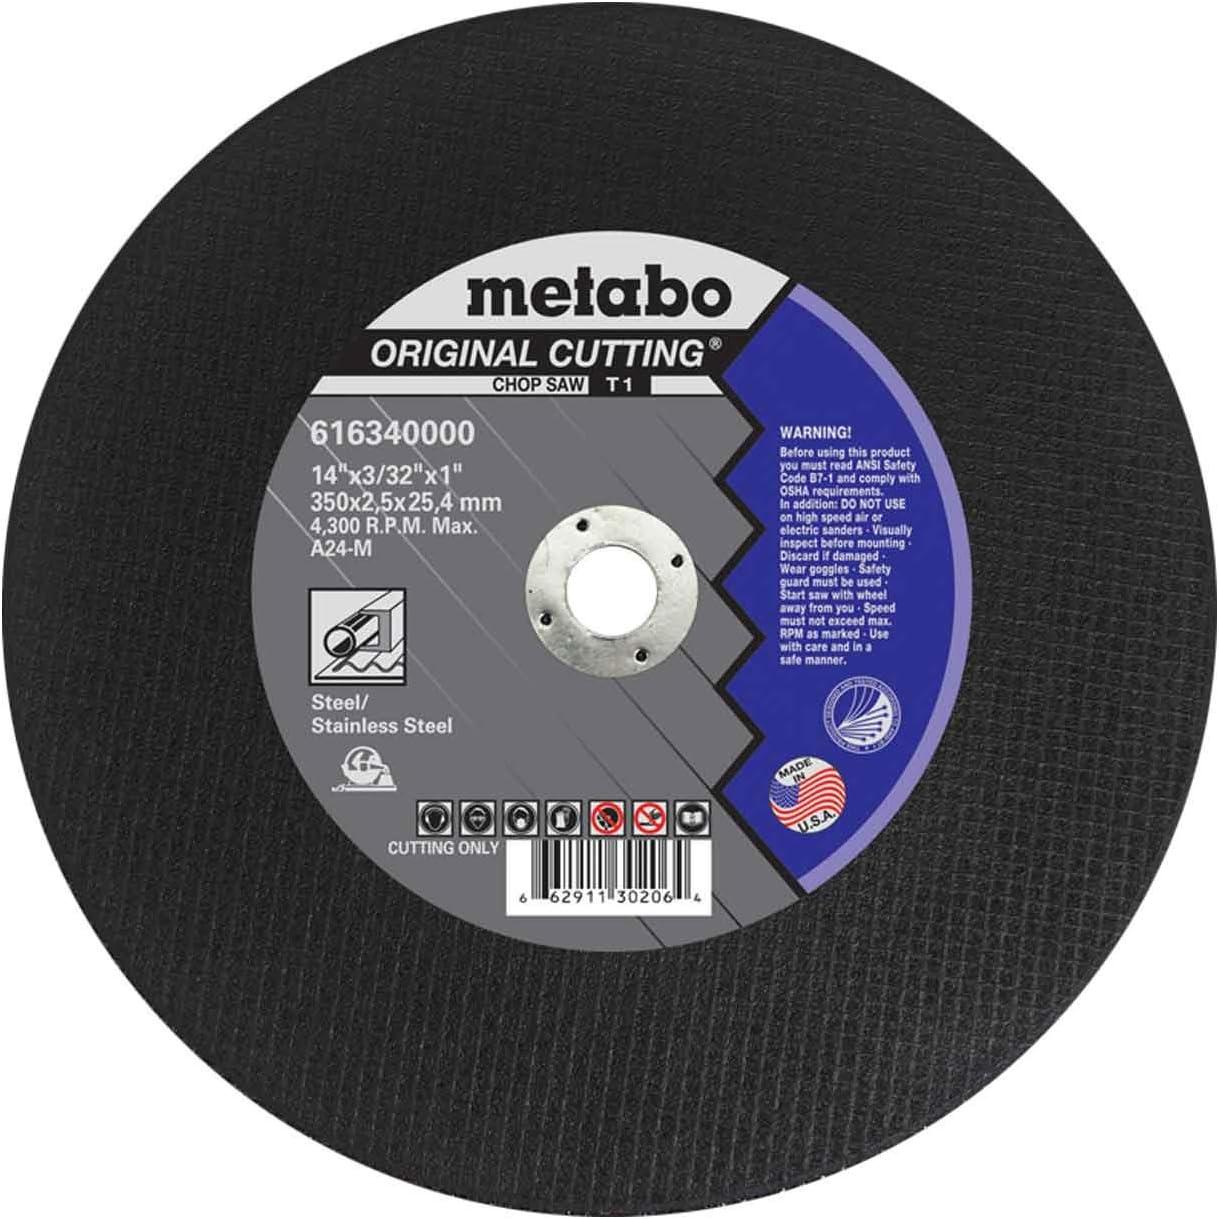 Metabo 616340000 14 x 3//32 x 1 Original Slicer A24M Chop Saw 10 pack